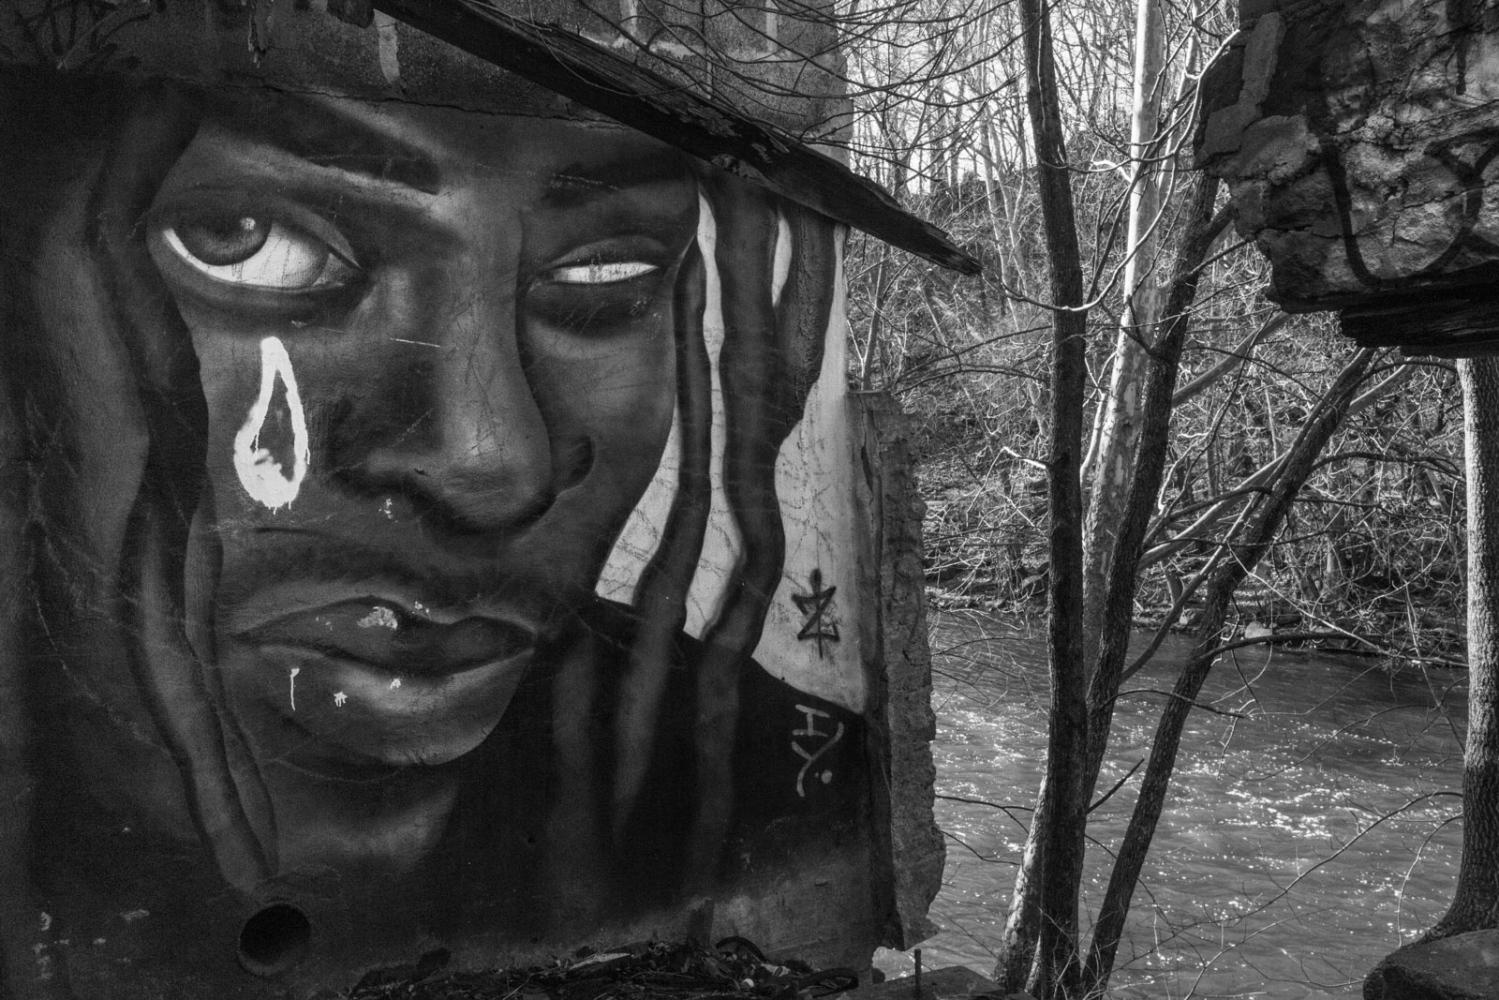 Art and Documentary Photography - Loading 24_HomeoftheBrave.jpg